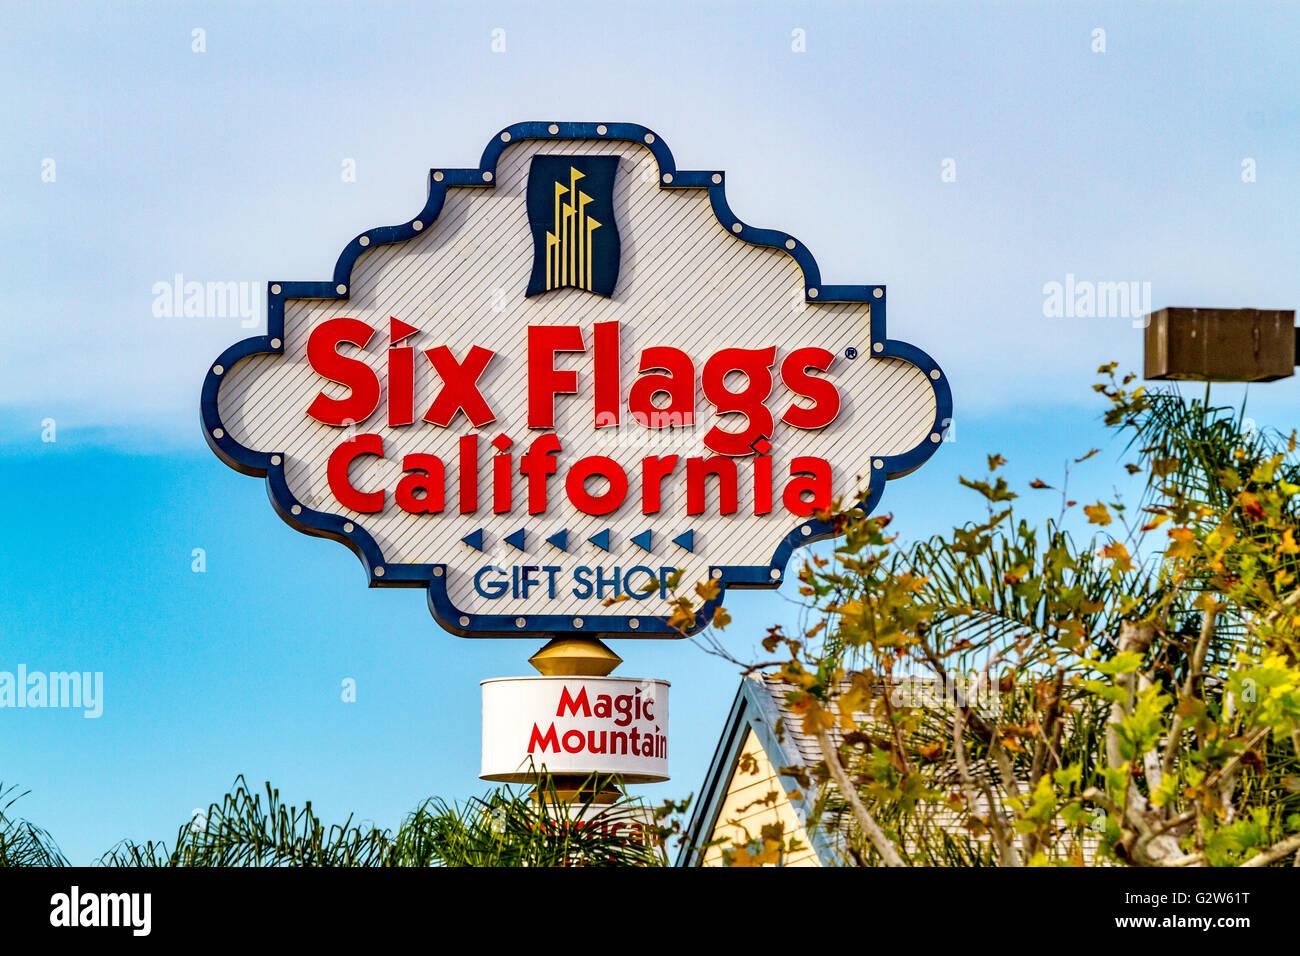 6 flags magic mountain california coupons